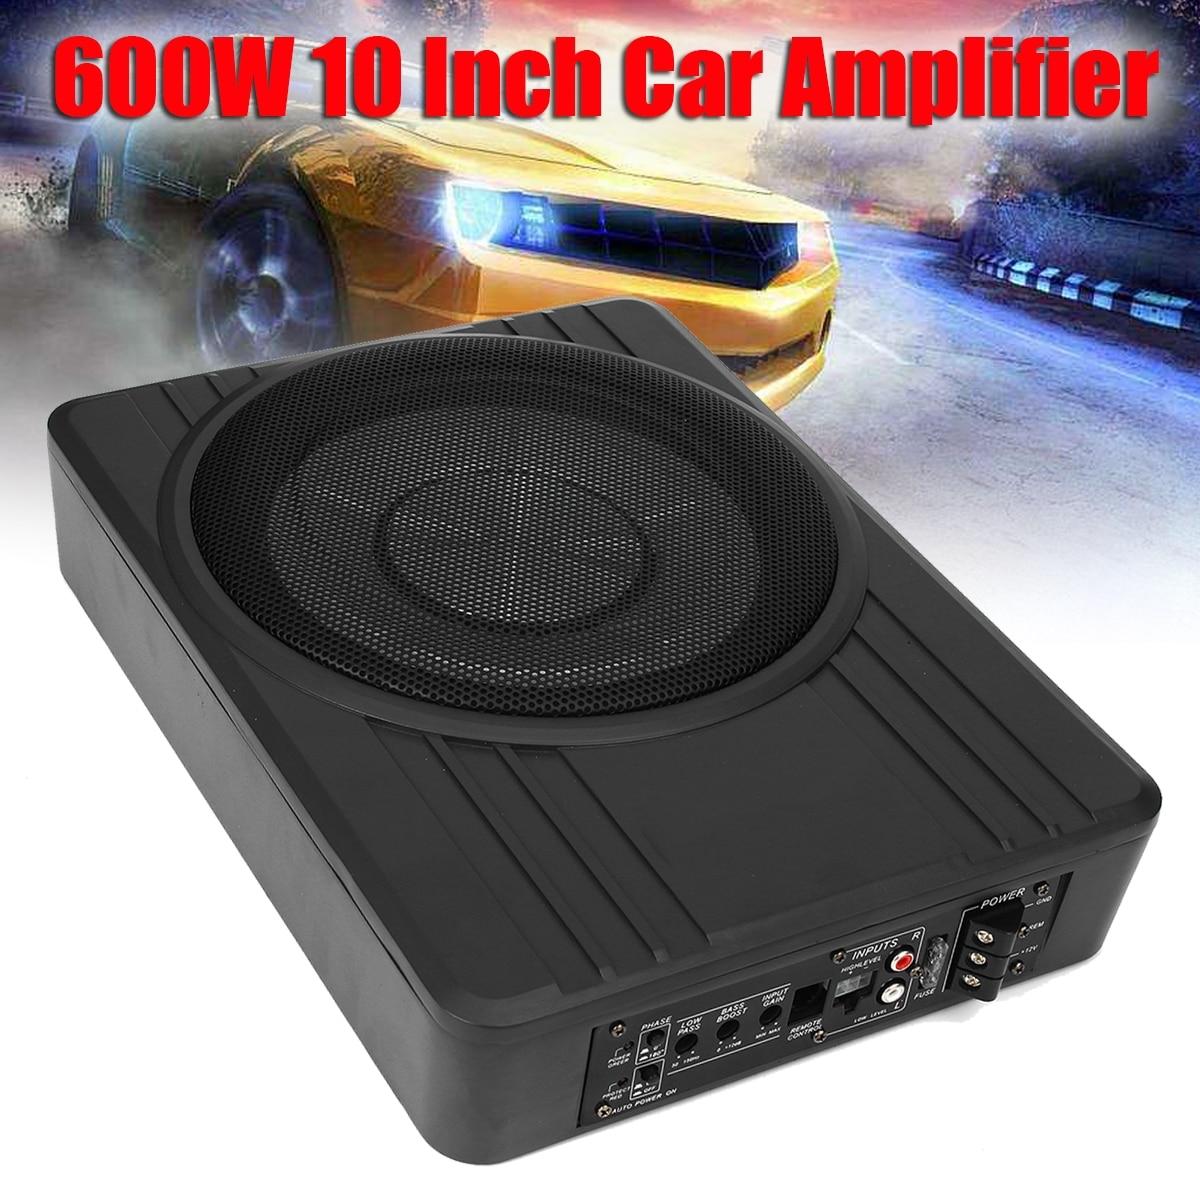 10 600W Car Active Subwoofer Speaker Audio Amplifier Vehicle Subwoofer Bass Amplifier Enclosure Auto Sound Car Audio Amplifier ysdx 596 silicone subwoofer amplifier speaker for ipod grey